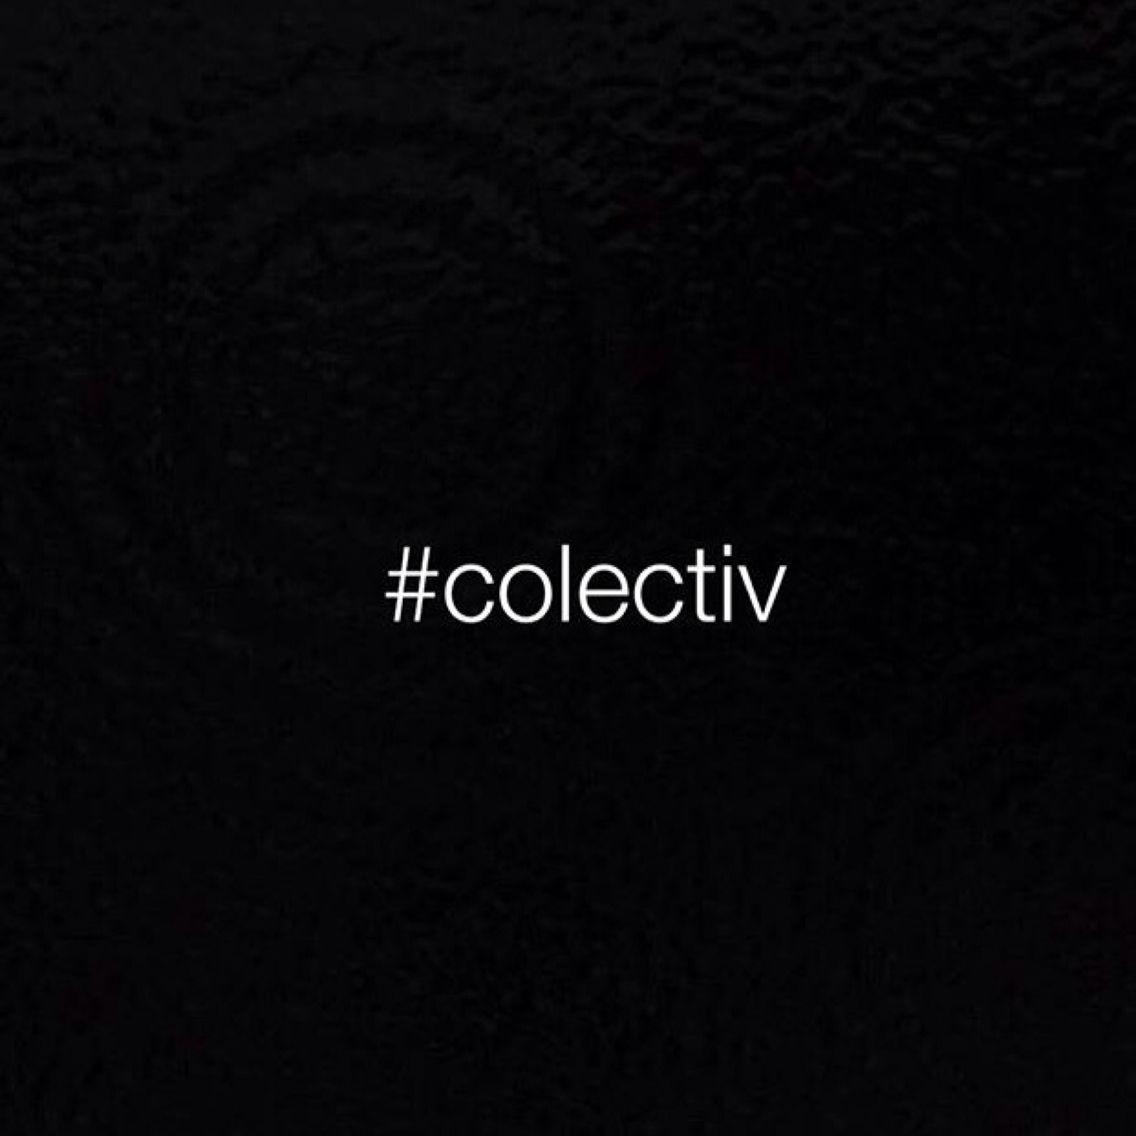 #colectiv #romania